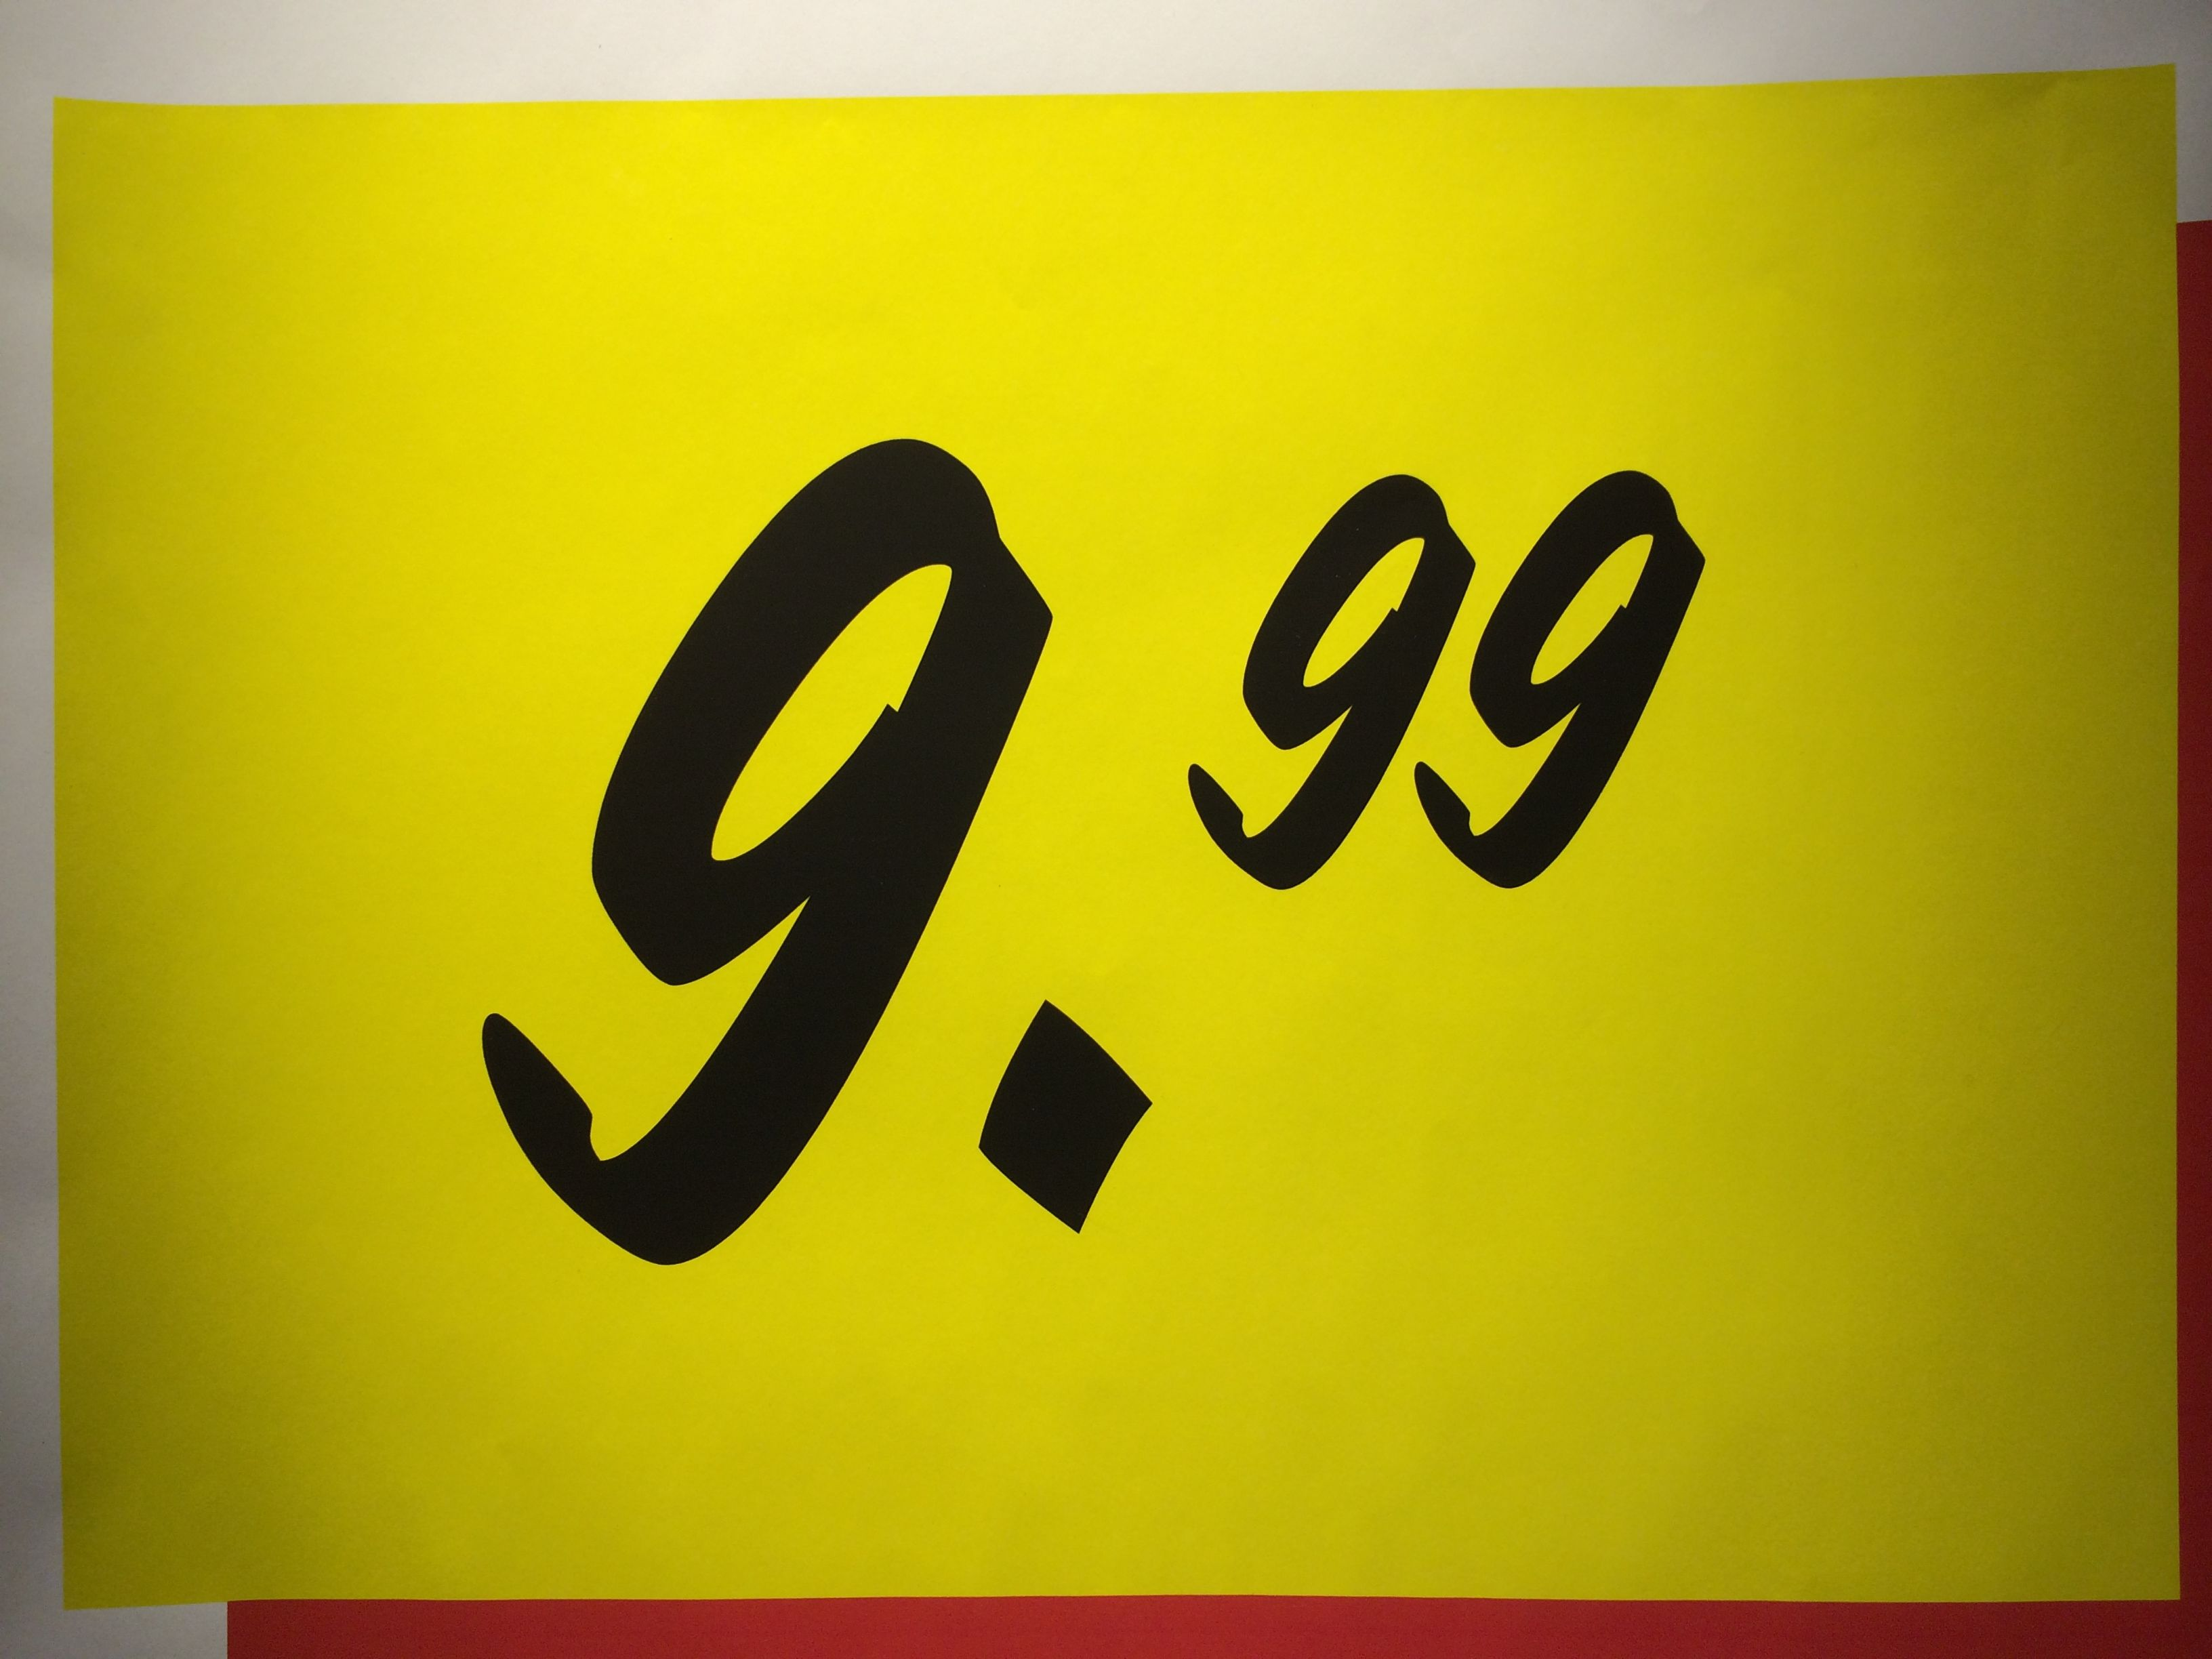 Yellow 9,99 Tag (August 17 2014, IKEA, Utrecht The Netherlands)